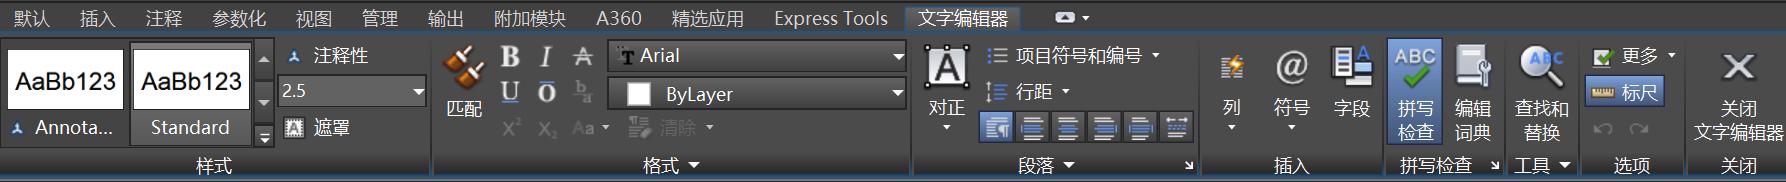 CAD多行文字怎么用,快捷键命令是什么